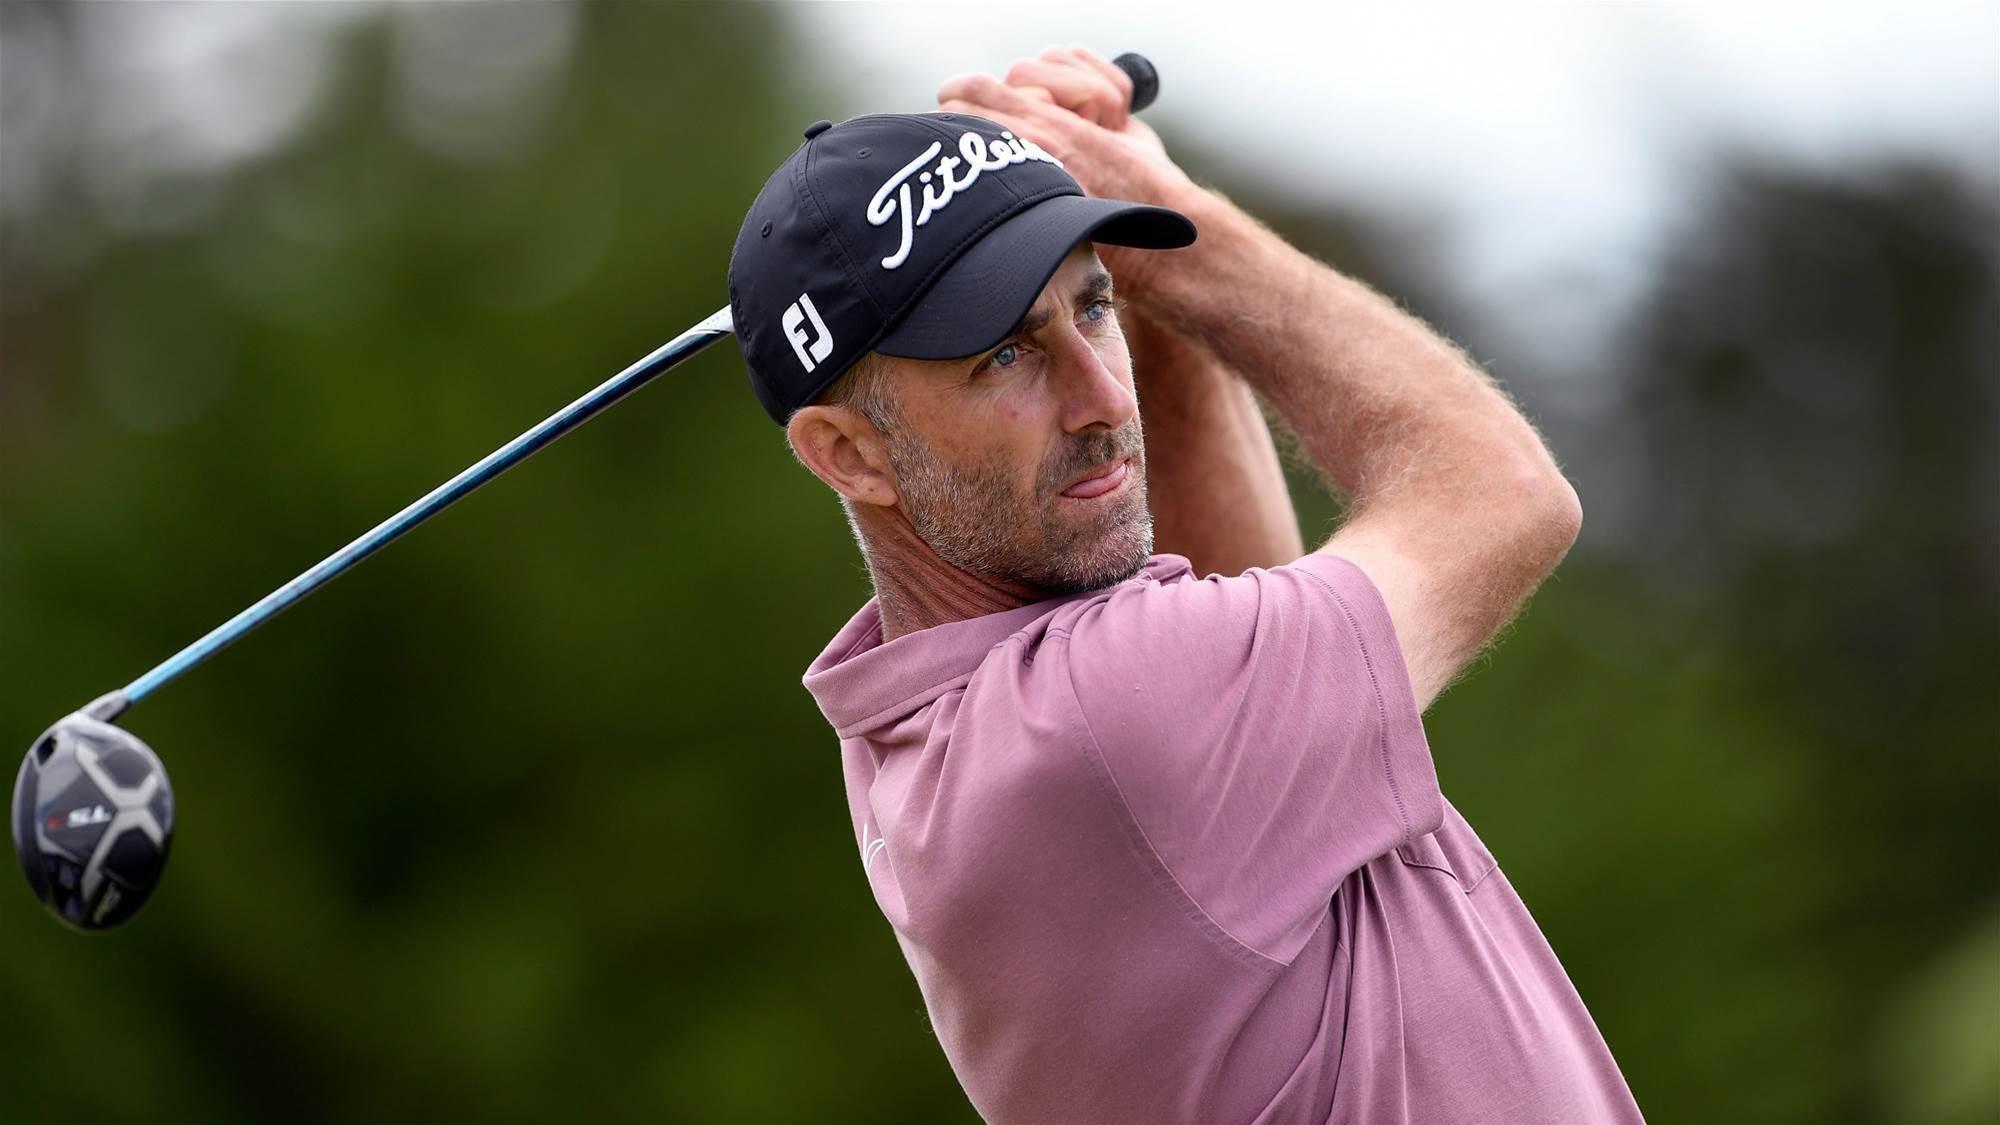 NZ Open has Ogilvy licking his lips